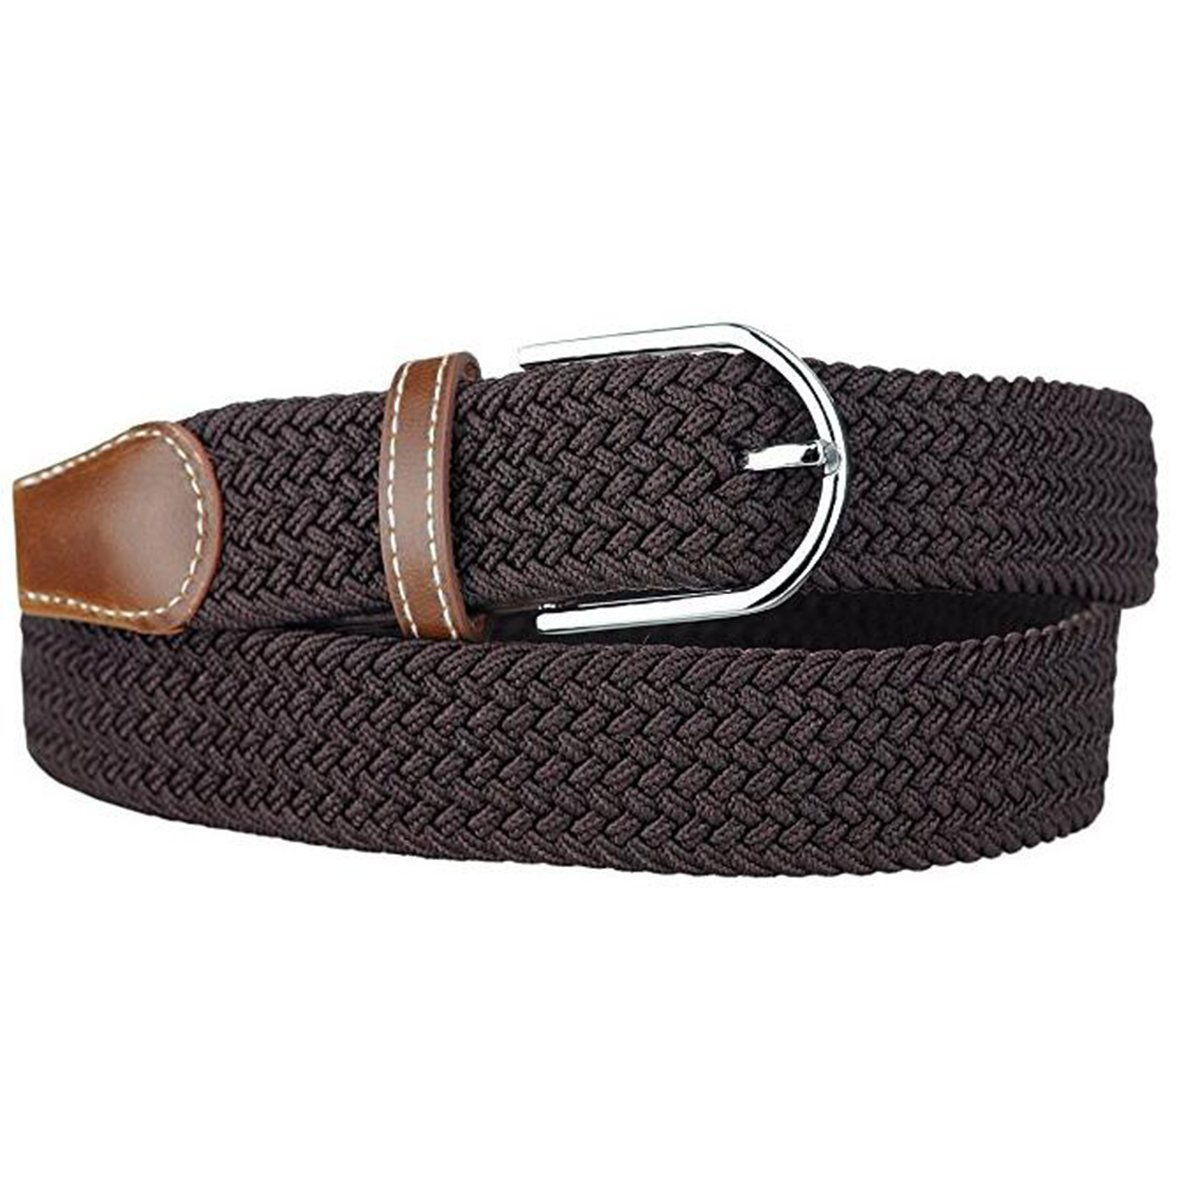 Jeracol Elastica Cintura uomo cinghia intrecciata pelle flessibile  quotidiano Cintura fibbia in metallo product image e8afe30732c